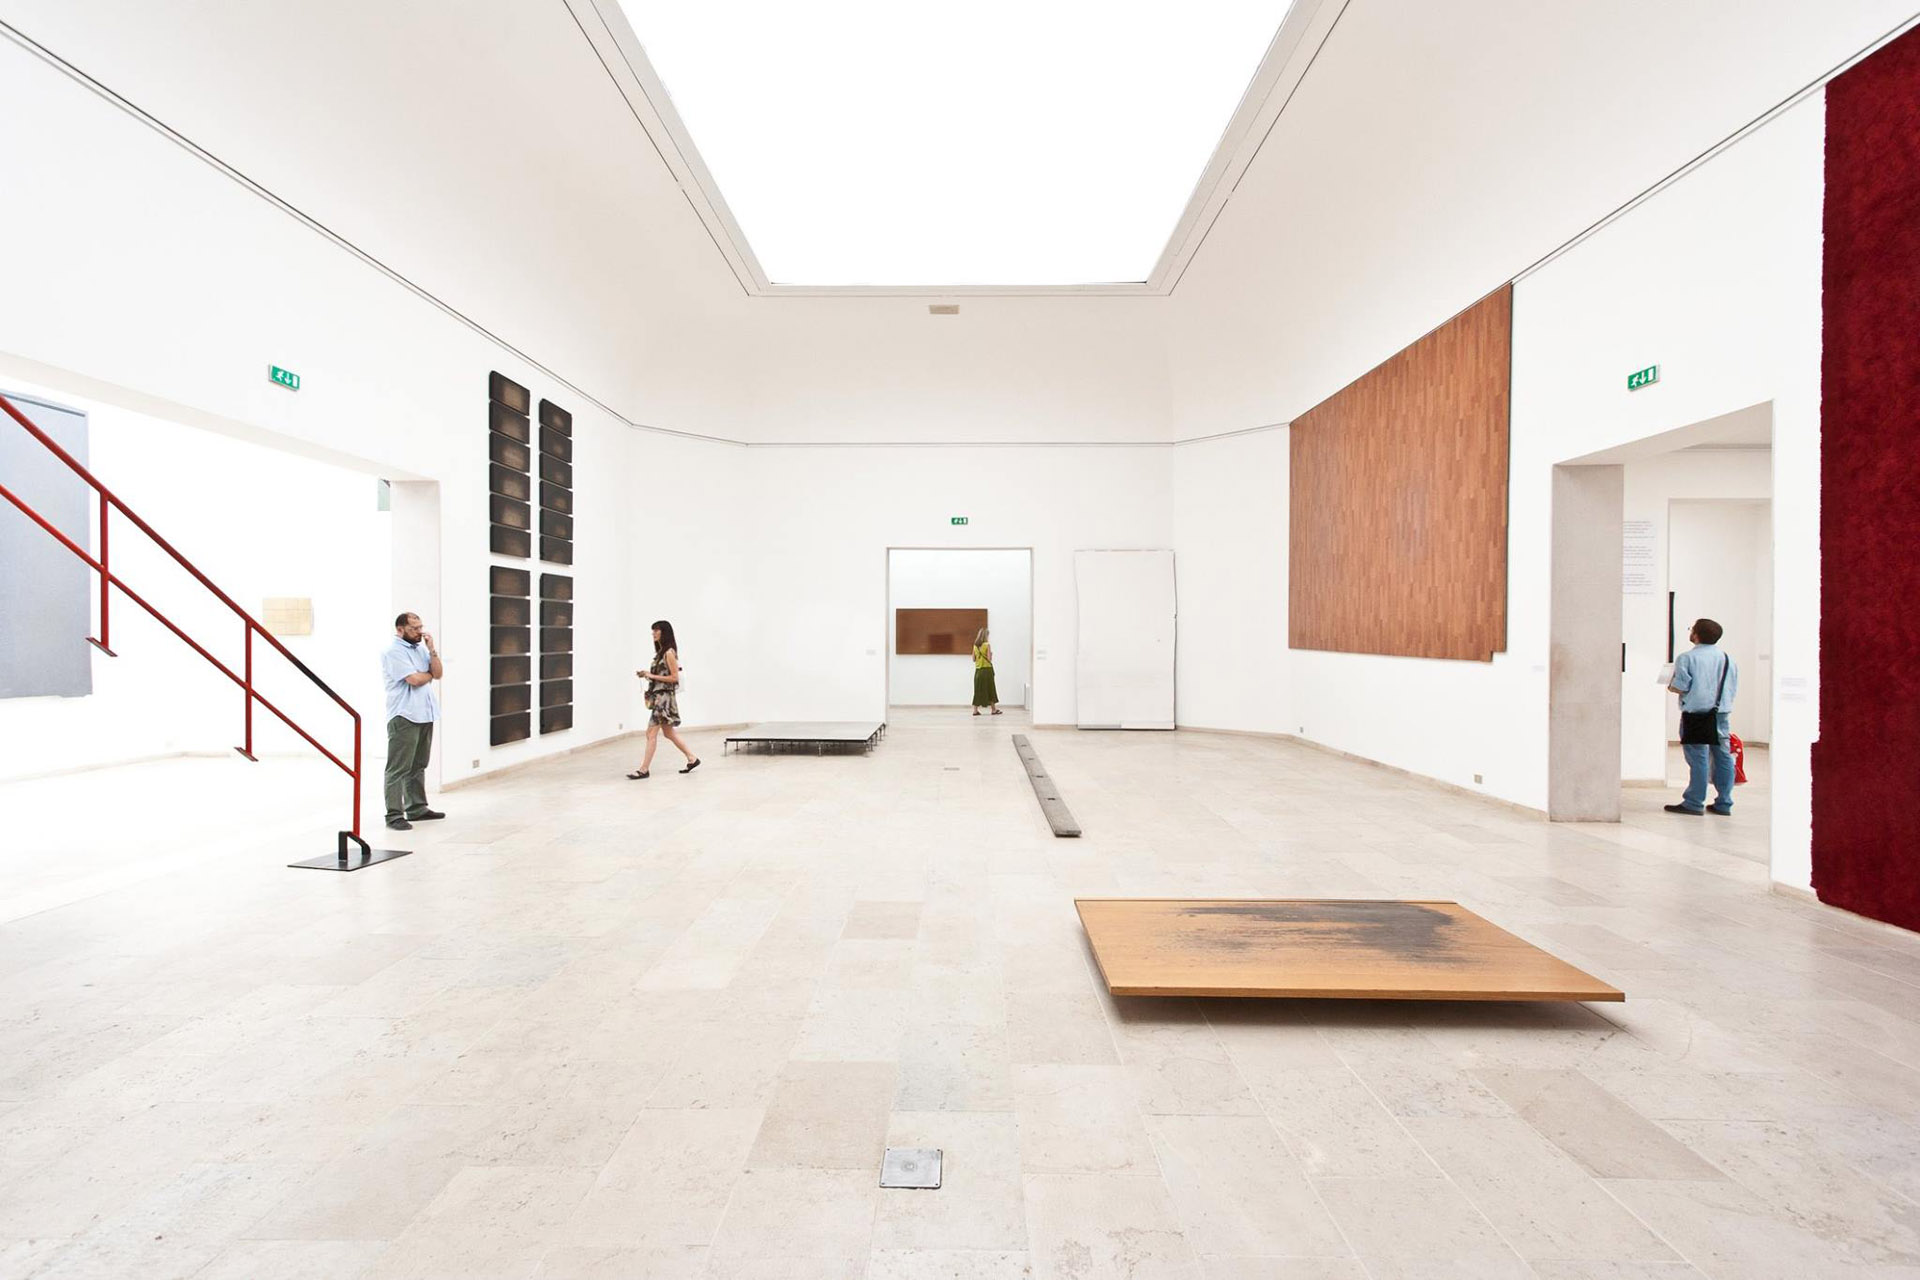 Usus_Usures_Venice Architecture Biennale 2010_picture_by_Eric_Mairiaux